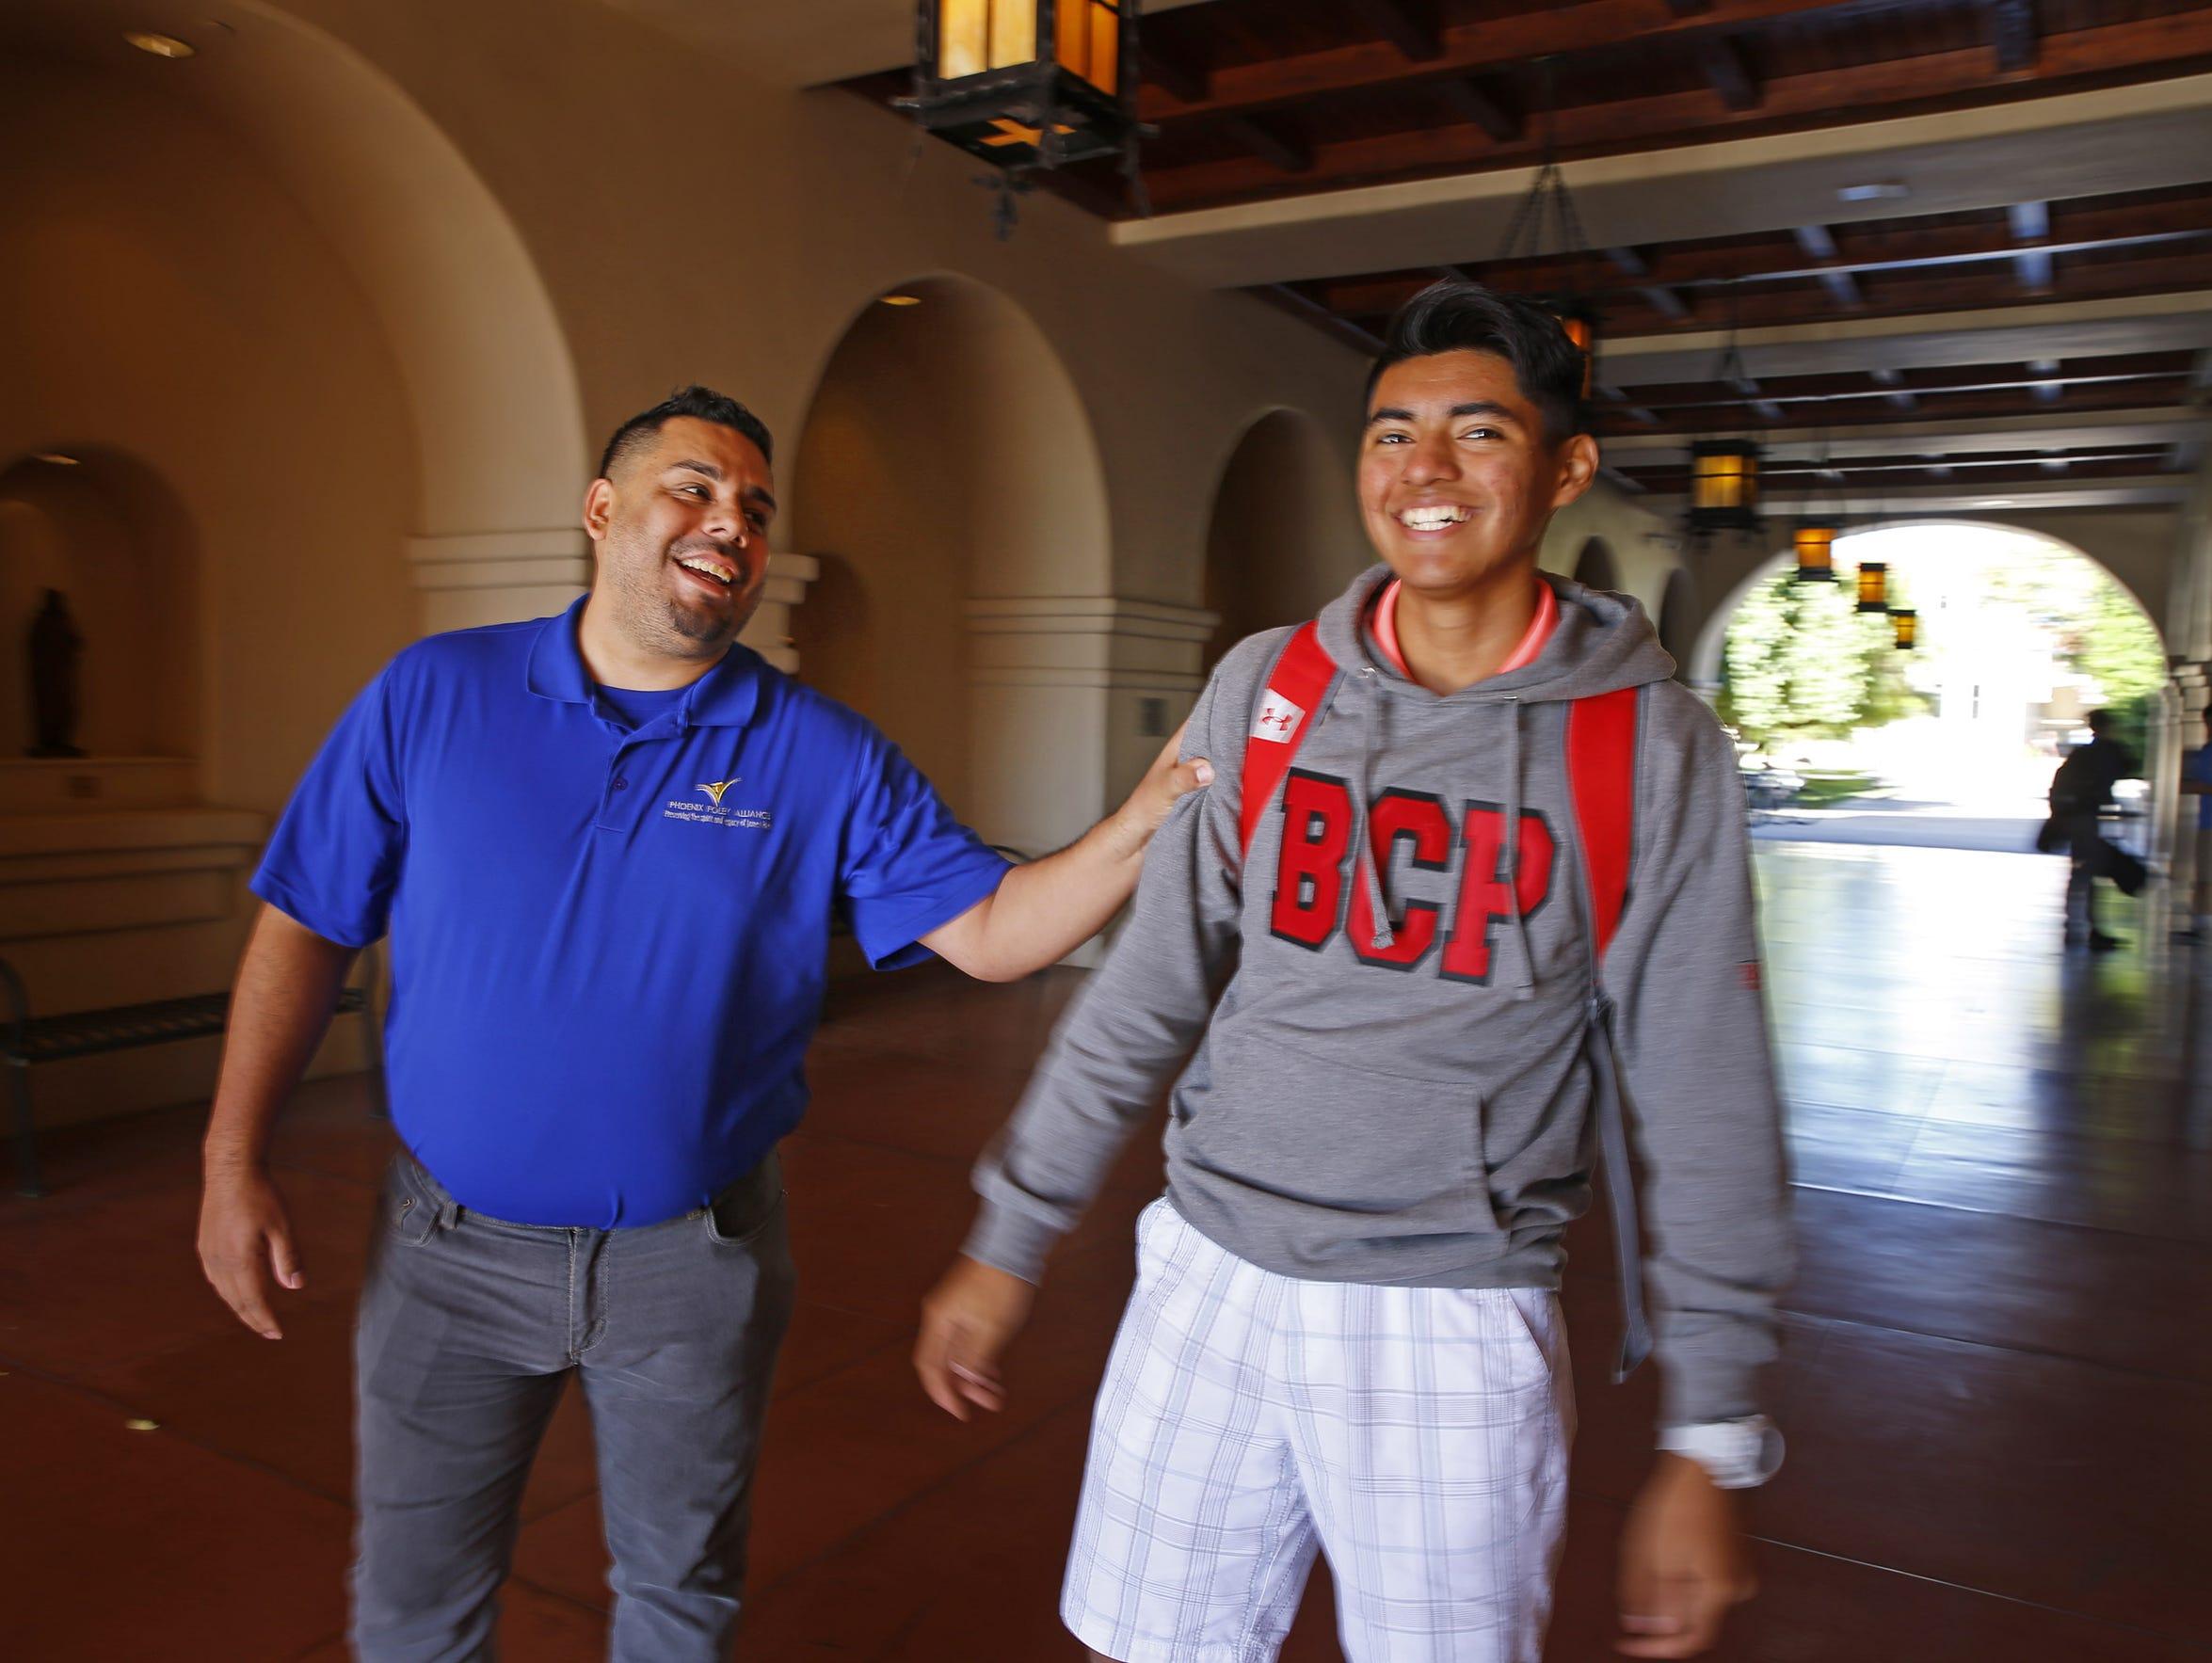 Eddie Martinez visited with Juan Alvarado at Brophy College Prep in Phoenix, where Eddie mentored Juan.